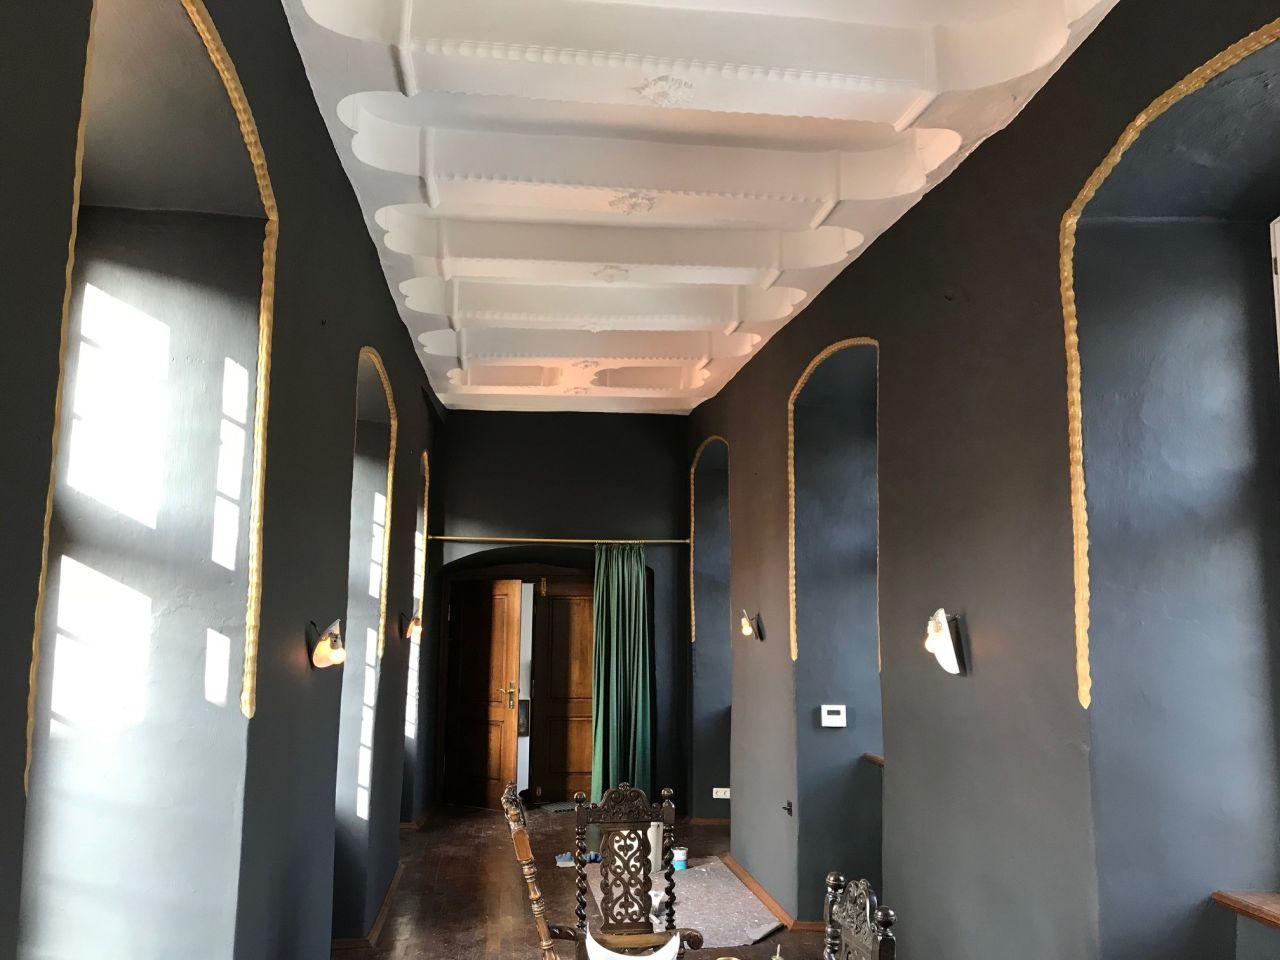 Berühmt Moderne Raumgestaltung - Malerbetrieb Poggel     Langeweile können VV07